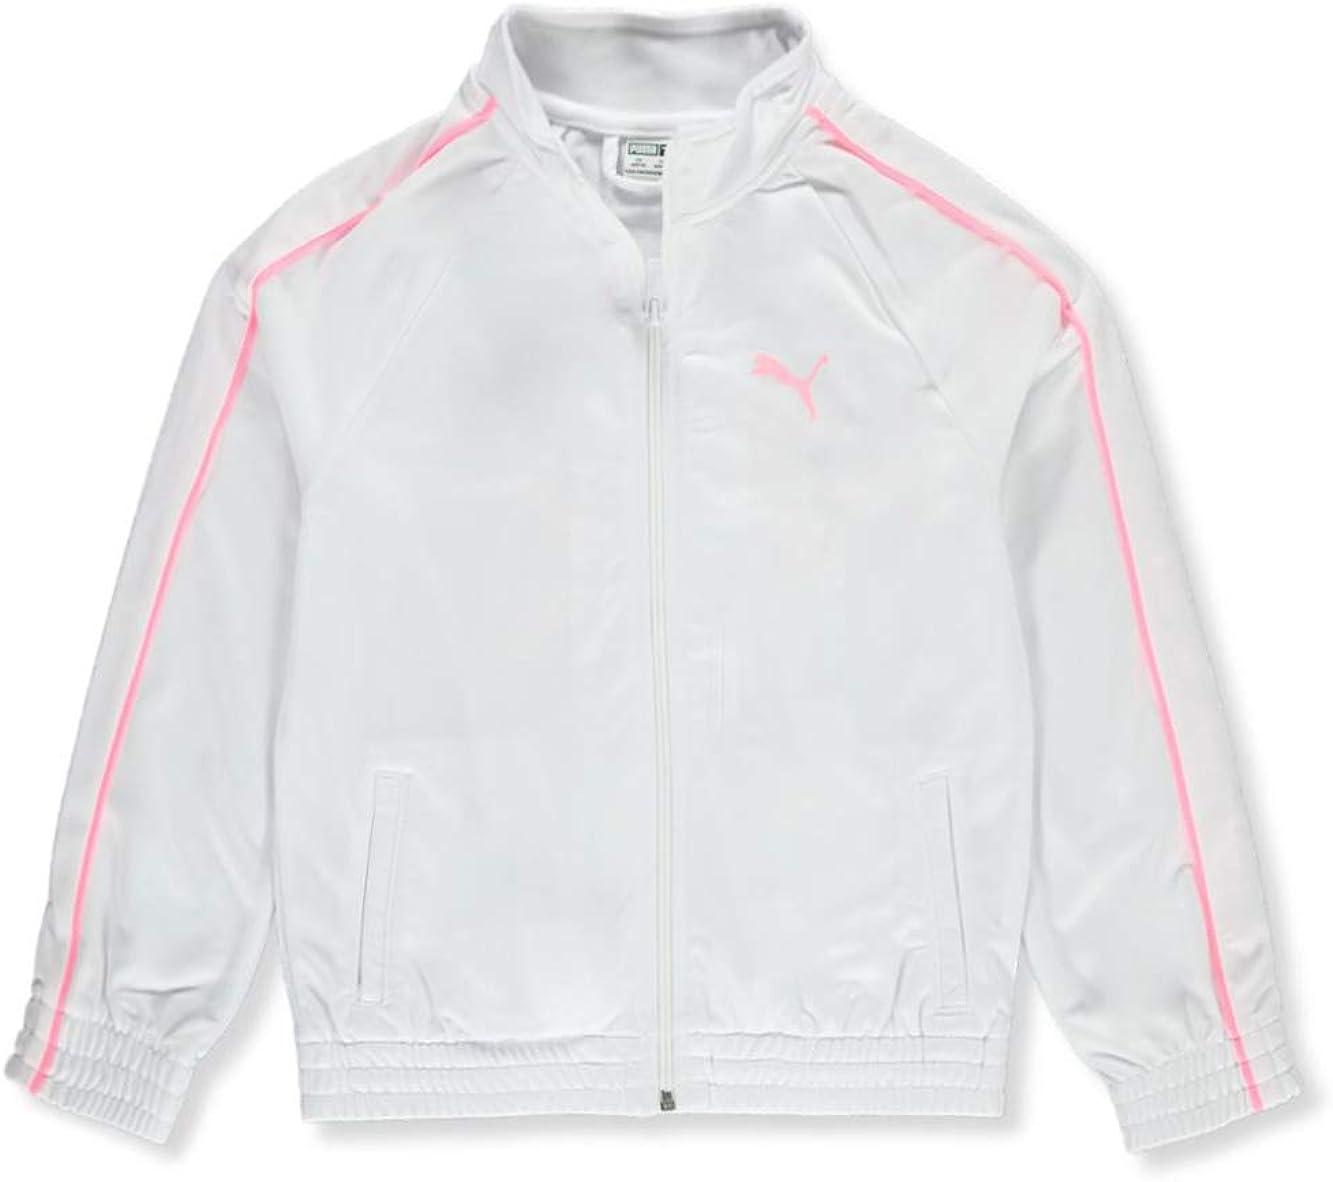 Puma Girls Piped Sleeve Track Jacket - White